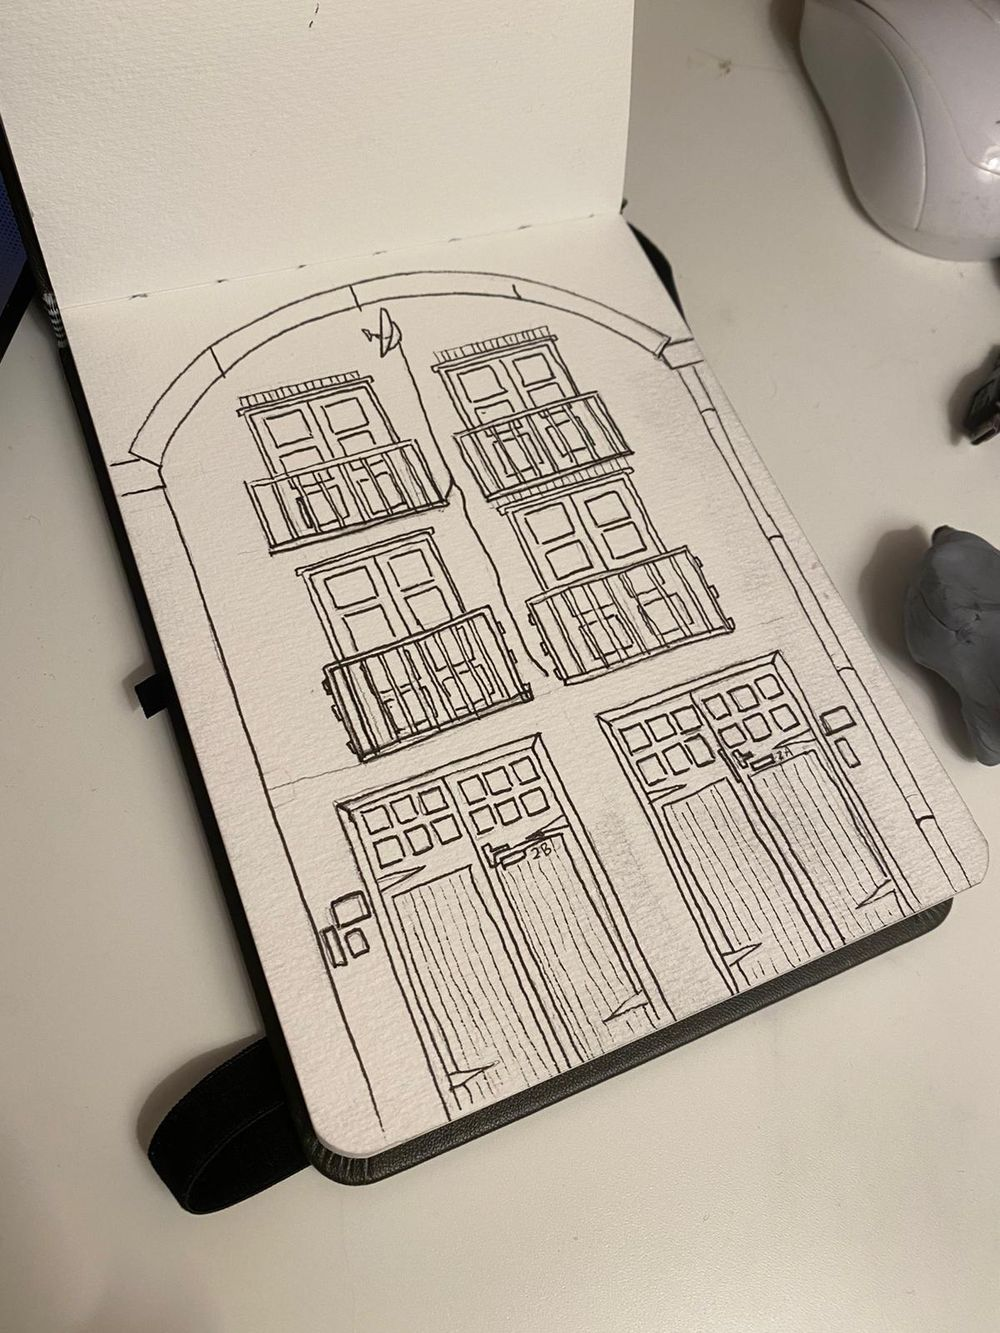 2A/2B Fenwick Pl   Urban Sketch & Paint - image 1 - student project